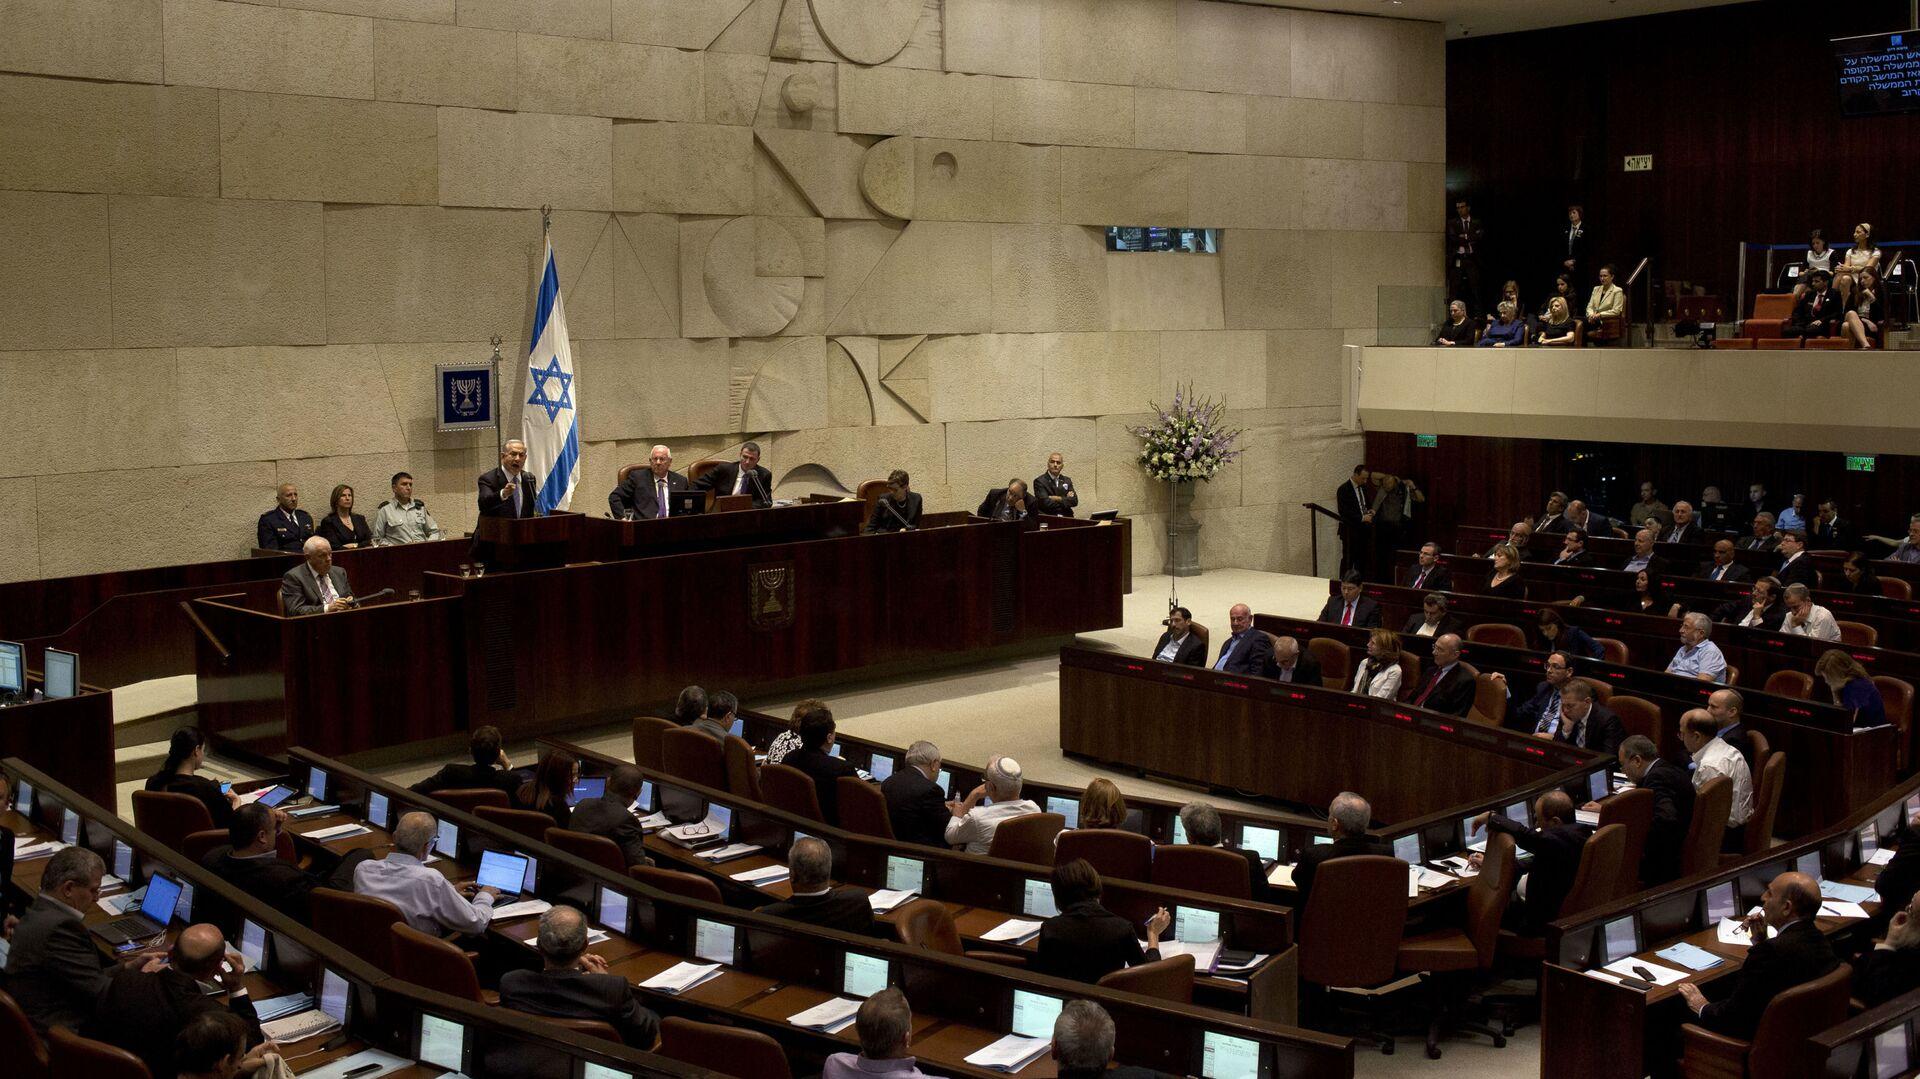 Knesset israeliano - Sputnik Italia, 1920, 13.06.2021